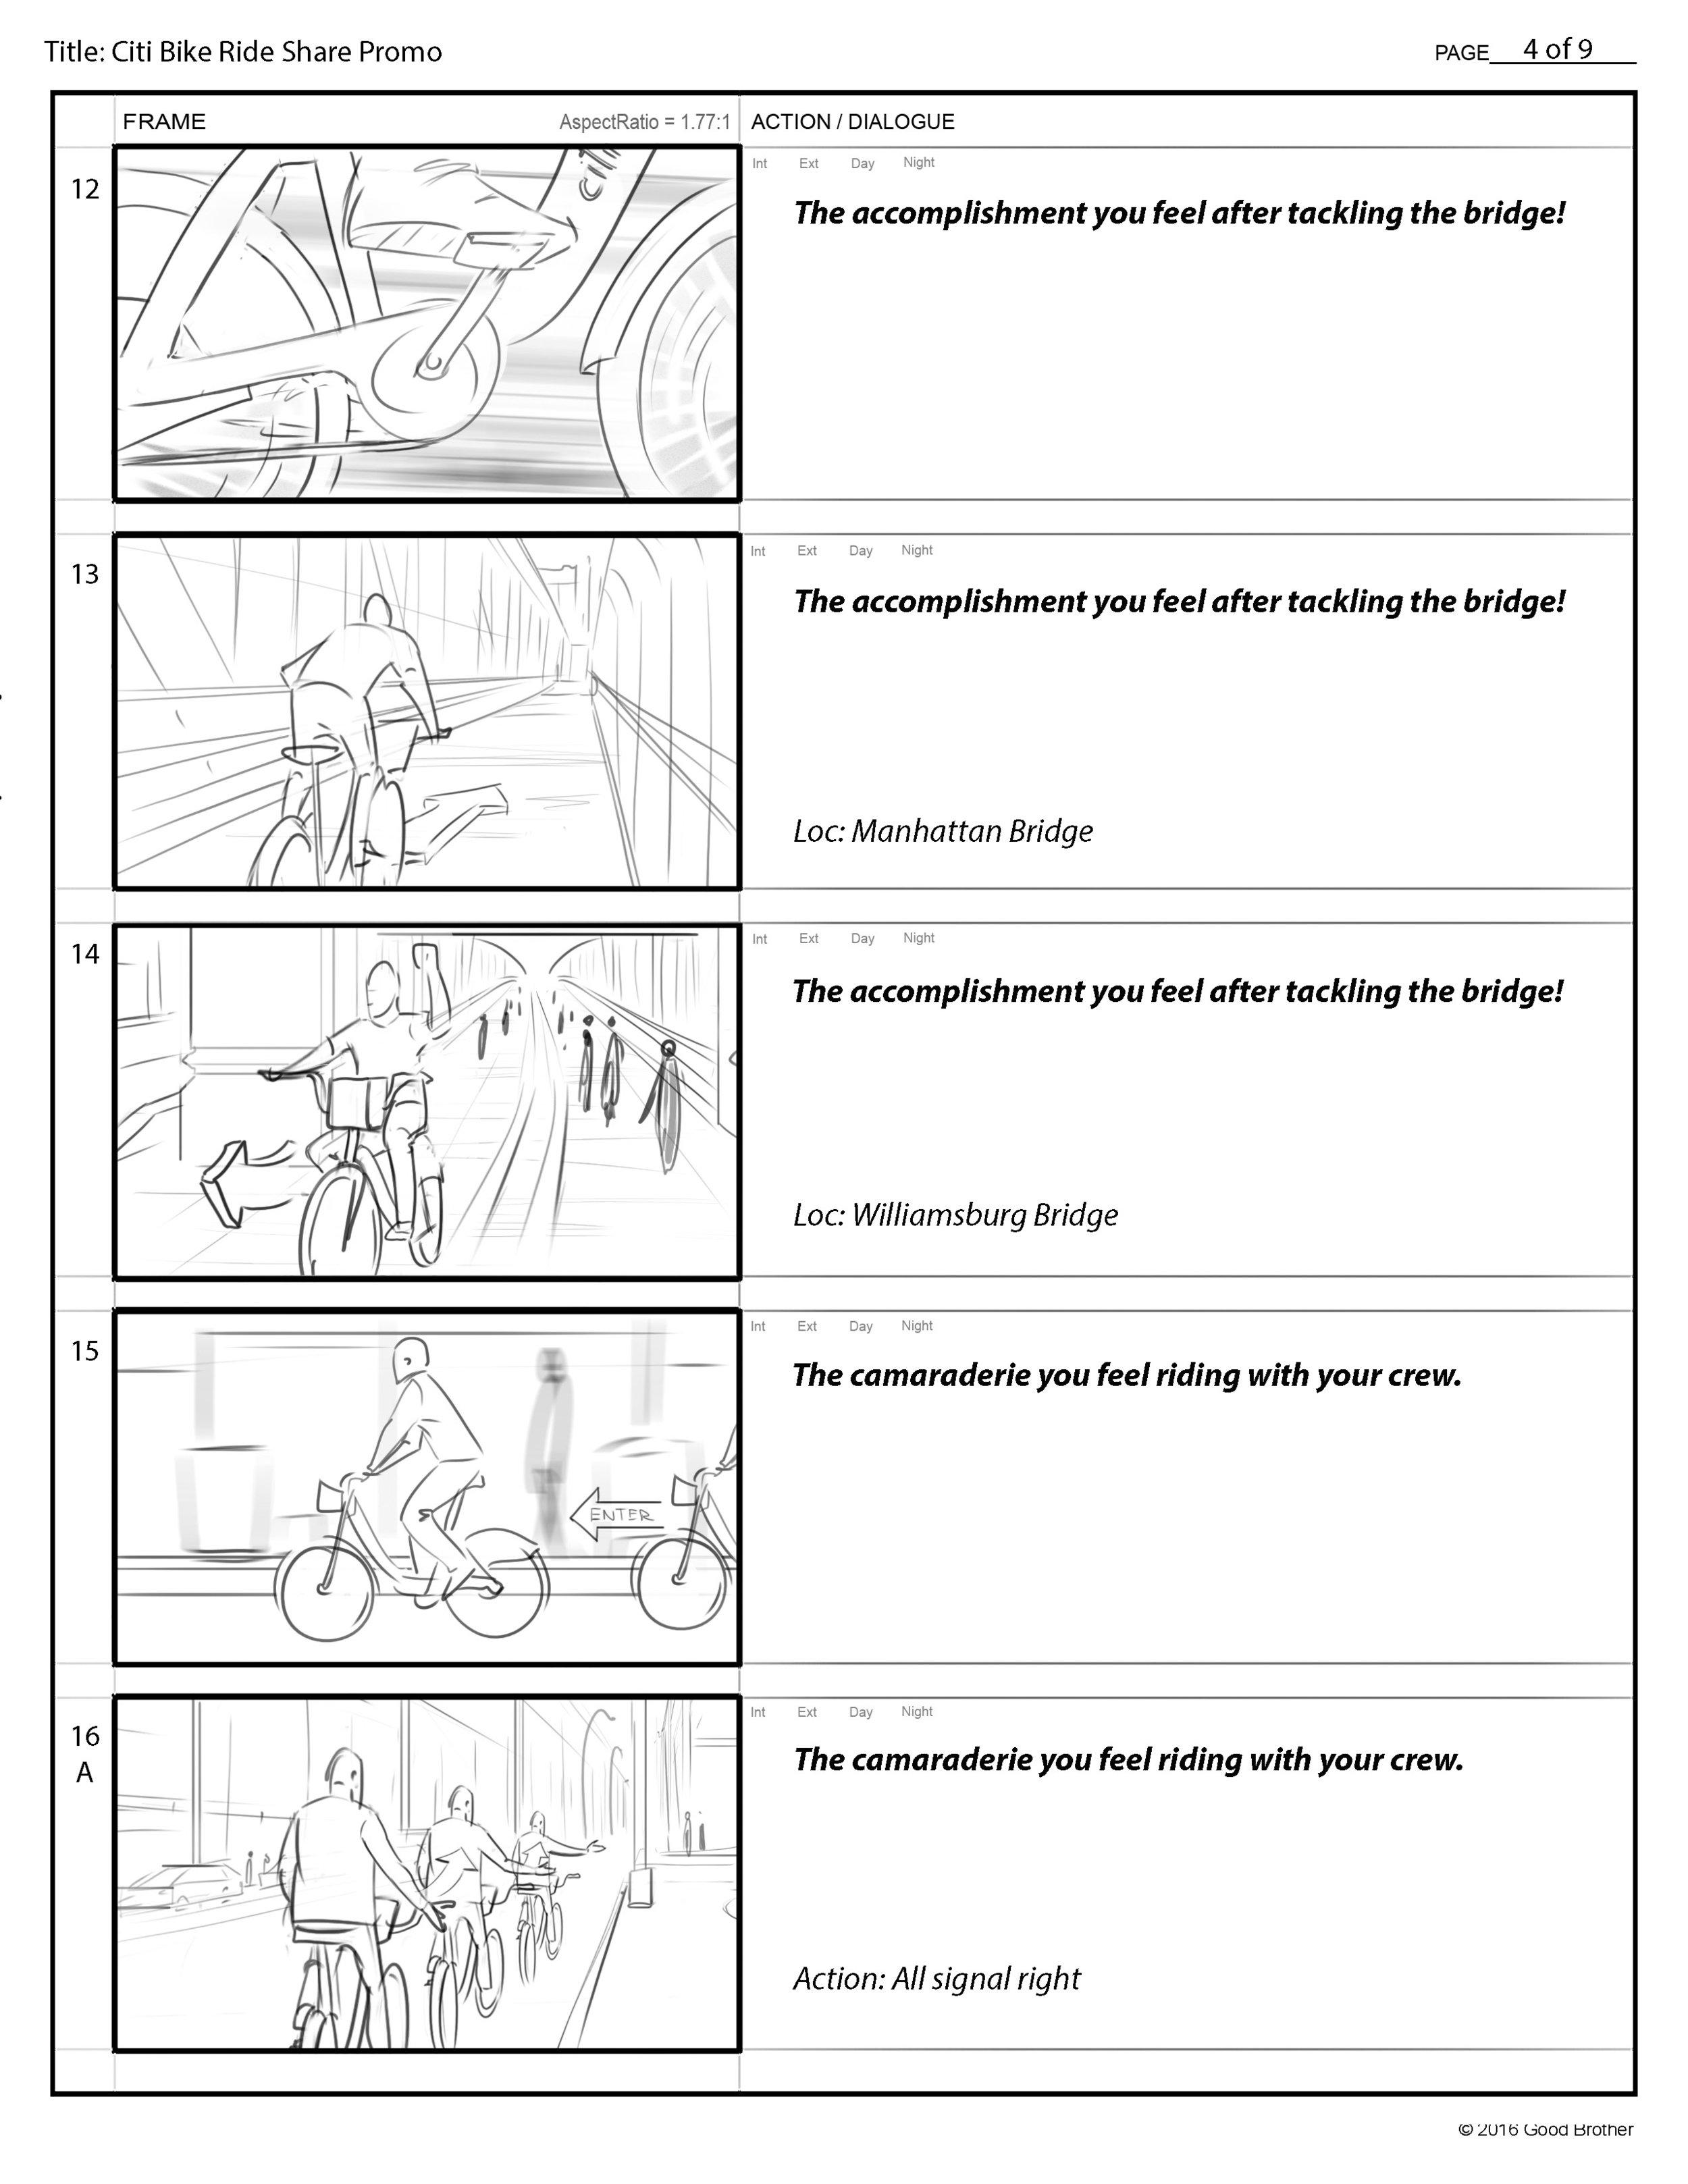 Citi Bike Storyboard FINAL_Page_4.jpg